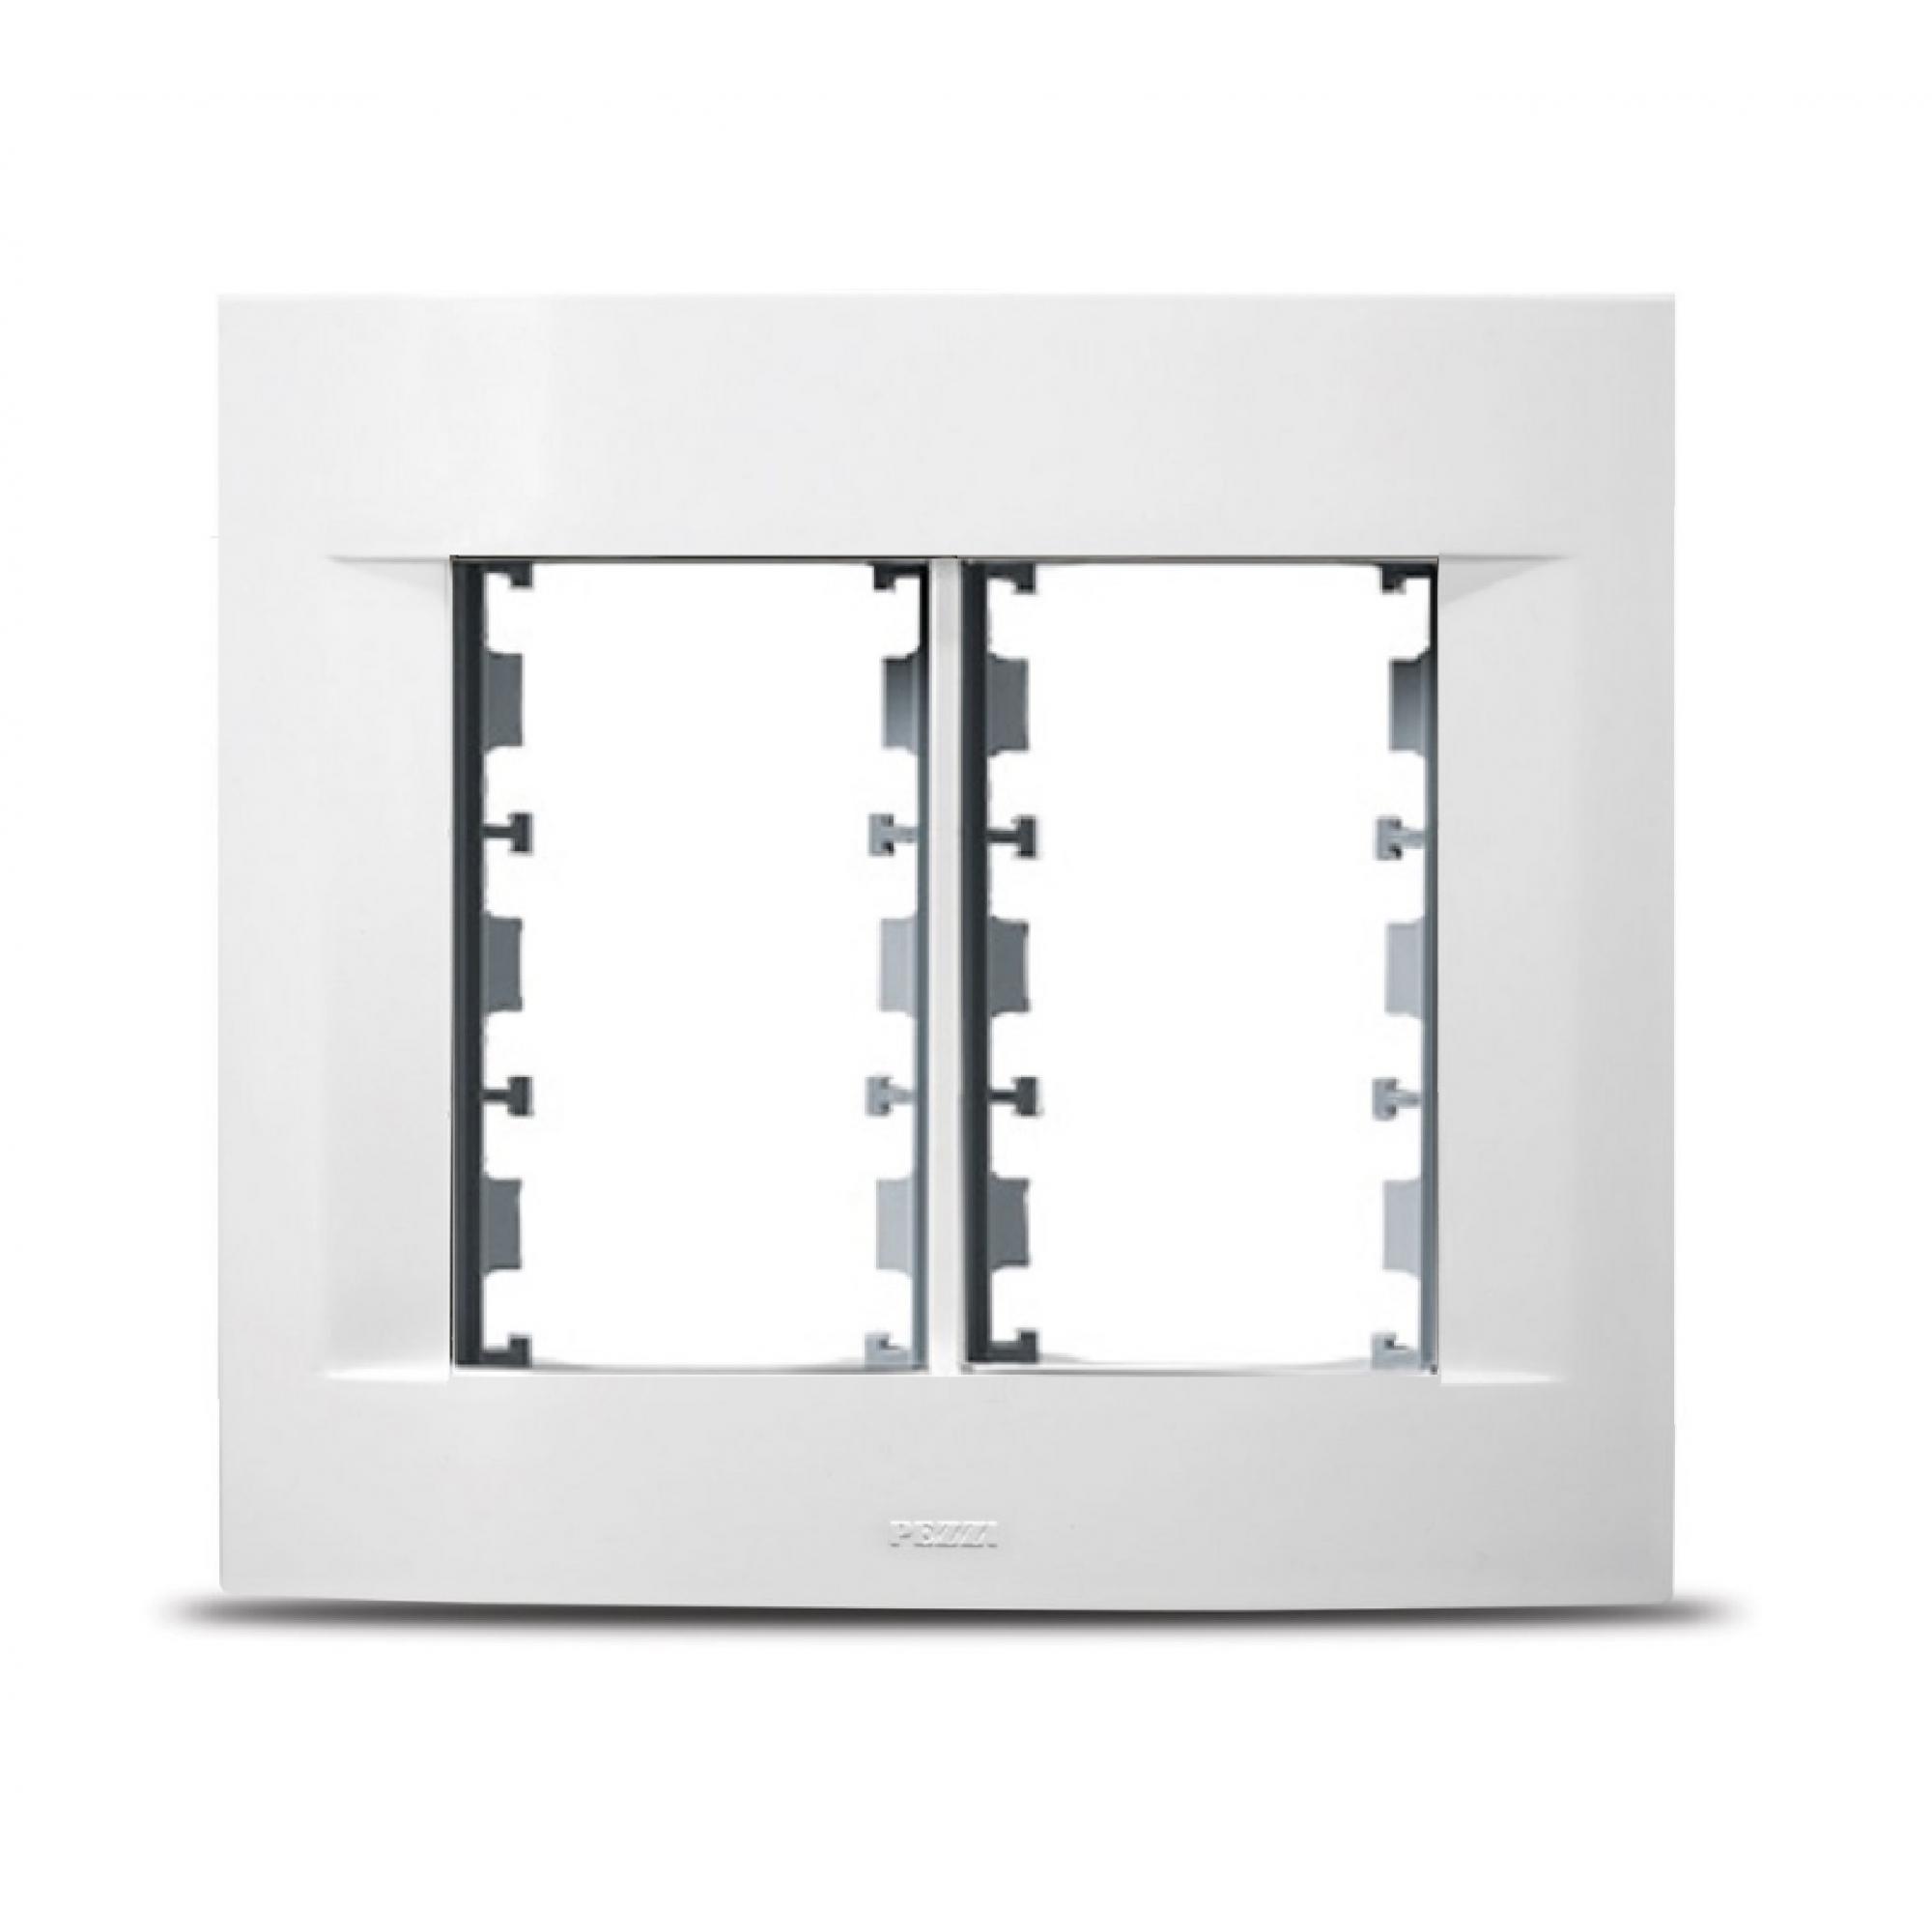 Espelho Hdmi 4x4 Completo, RJ45, USB Charger, Tomada - SHG1